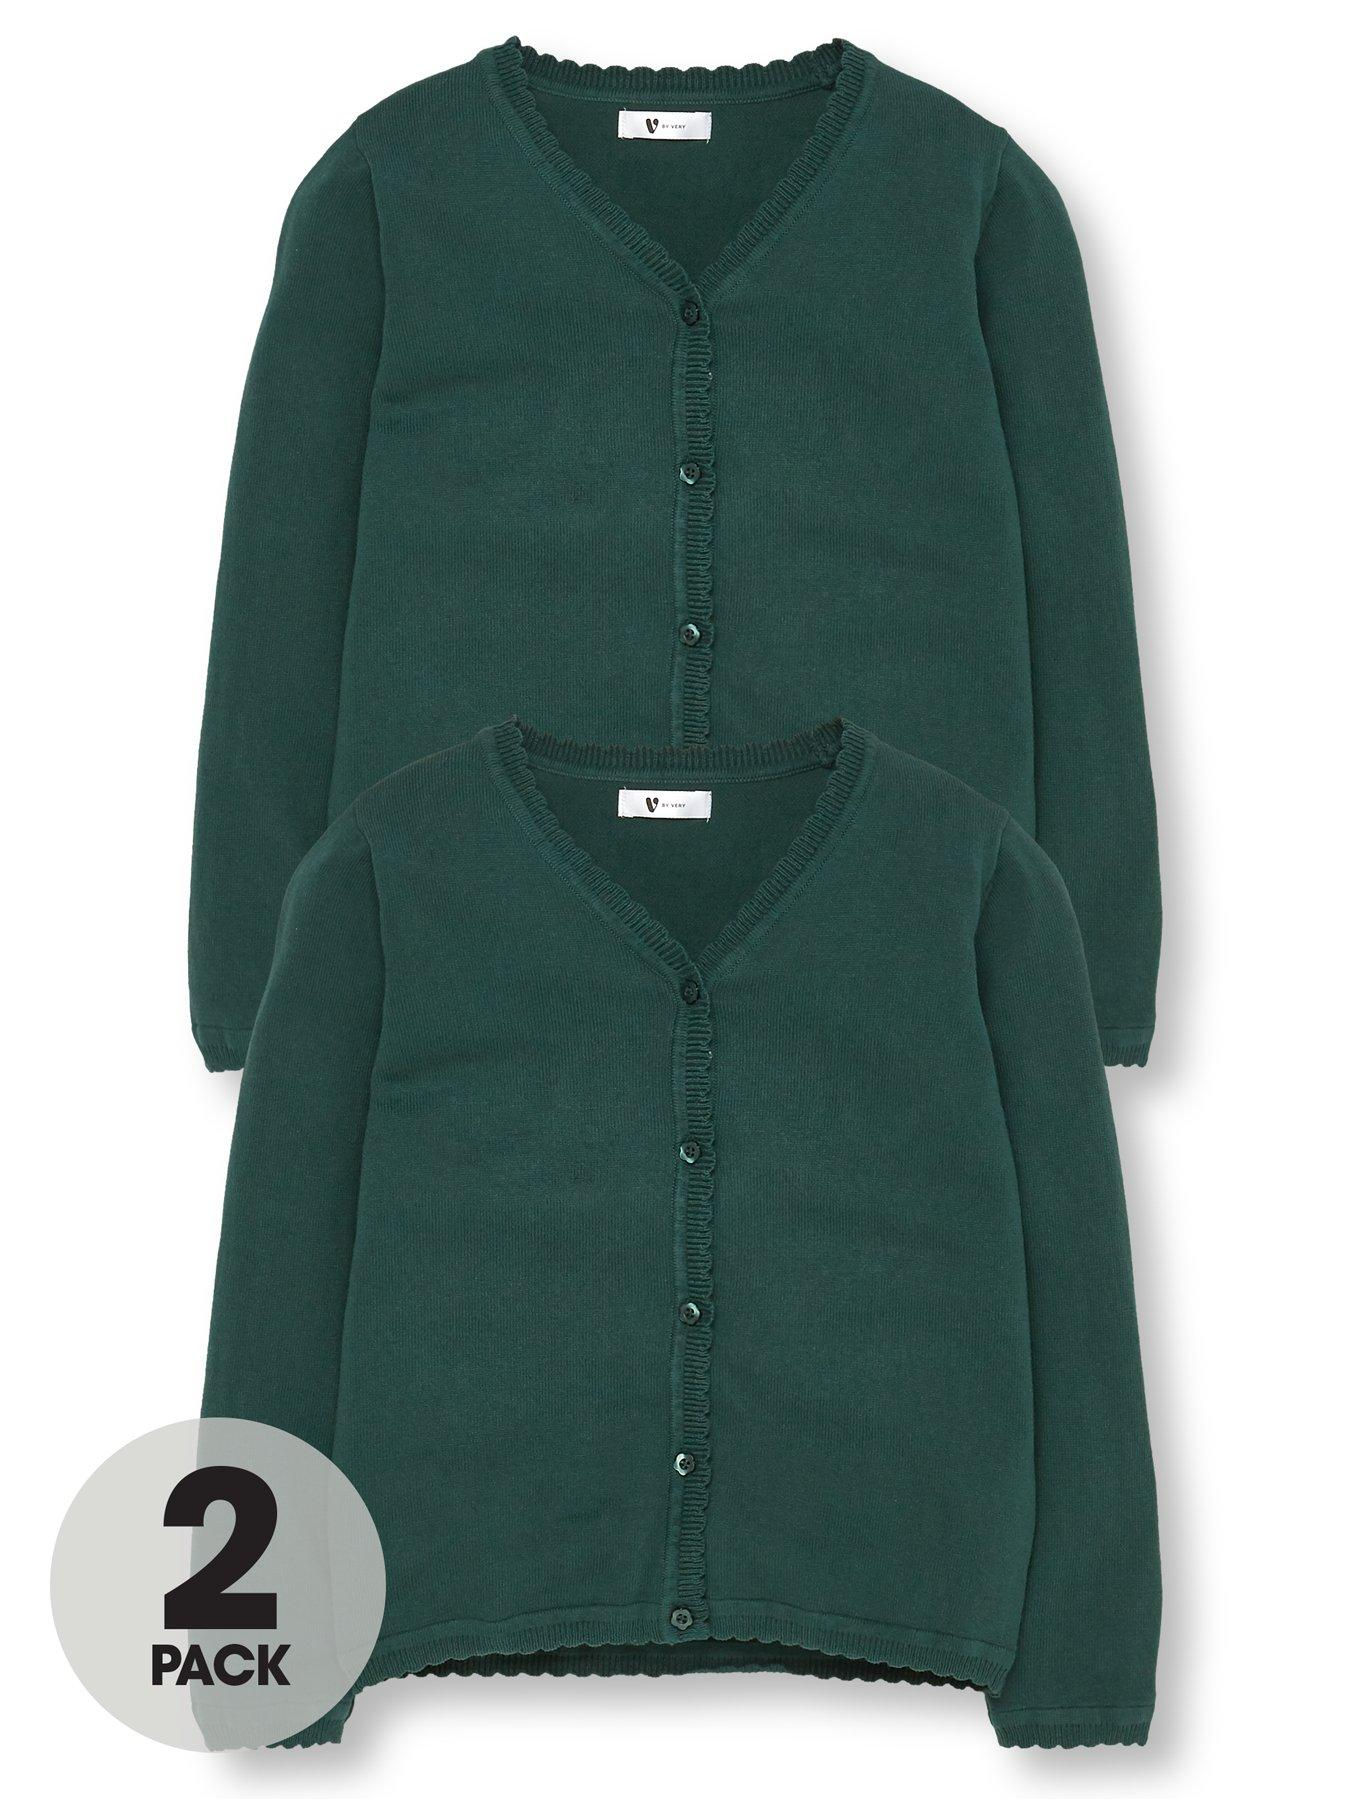 Girls x2 Open Neck Revere Collar Blouses Twin 2 In Pack Blouse School Uniform